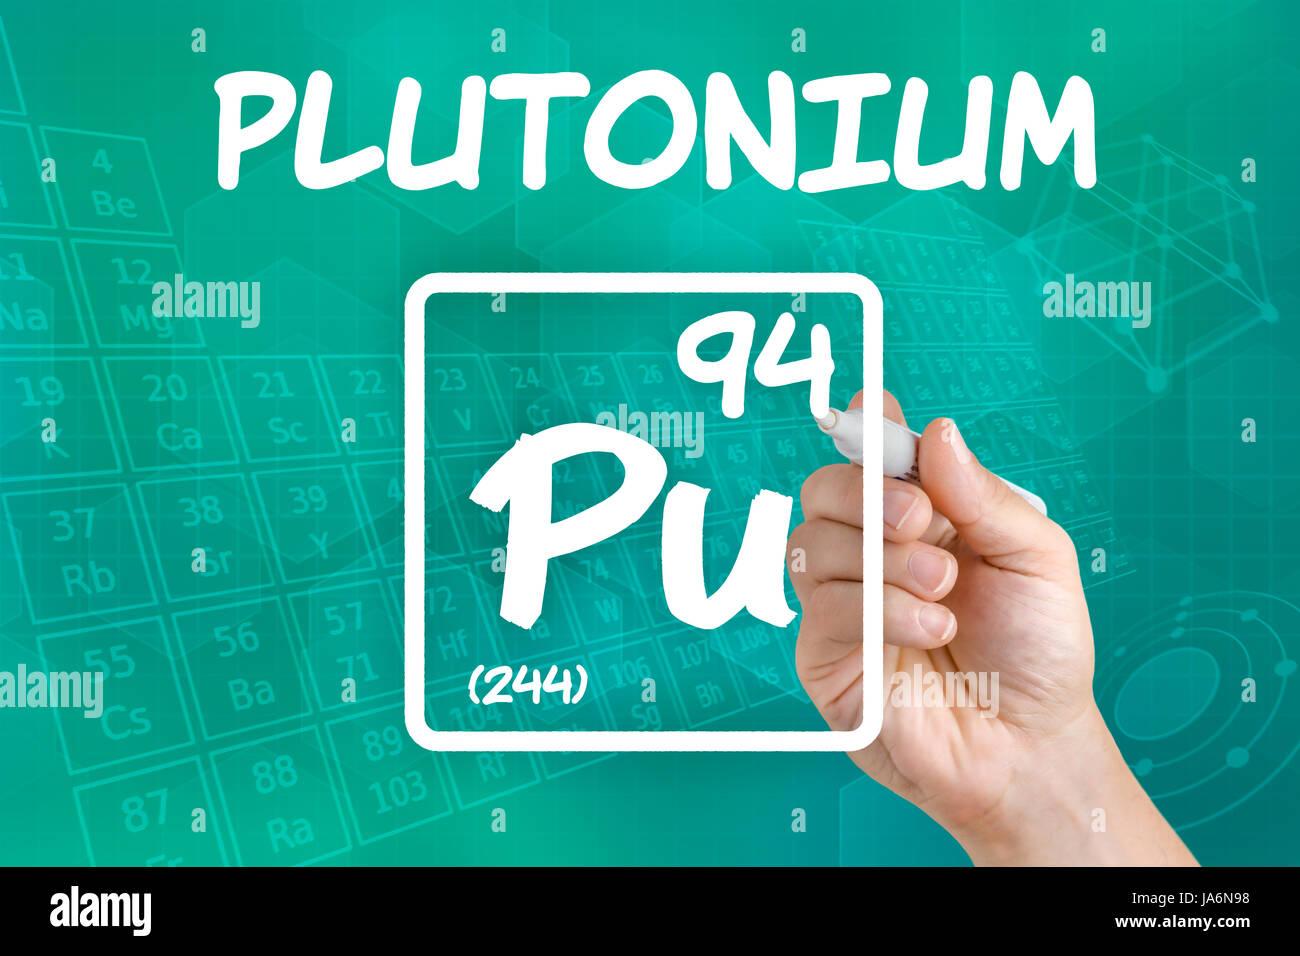 Symbol Of The Chemical Element Plutonium Stock Photo 143977940 Alamy